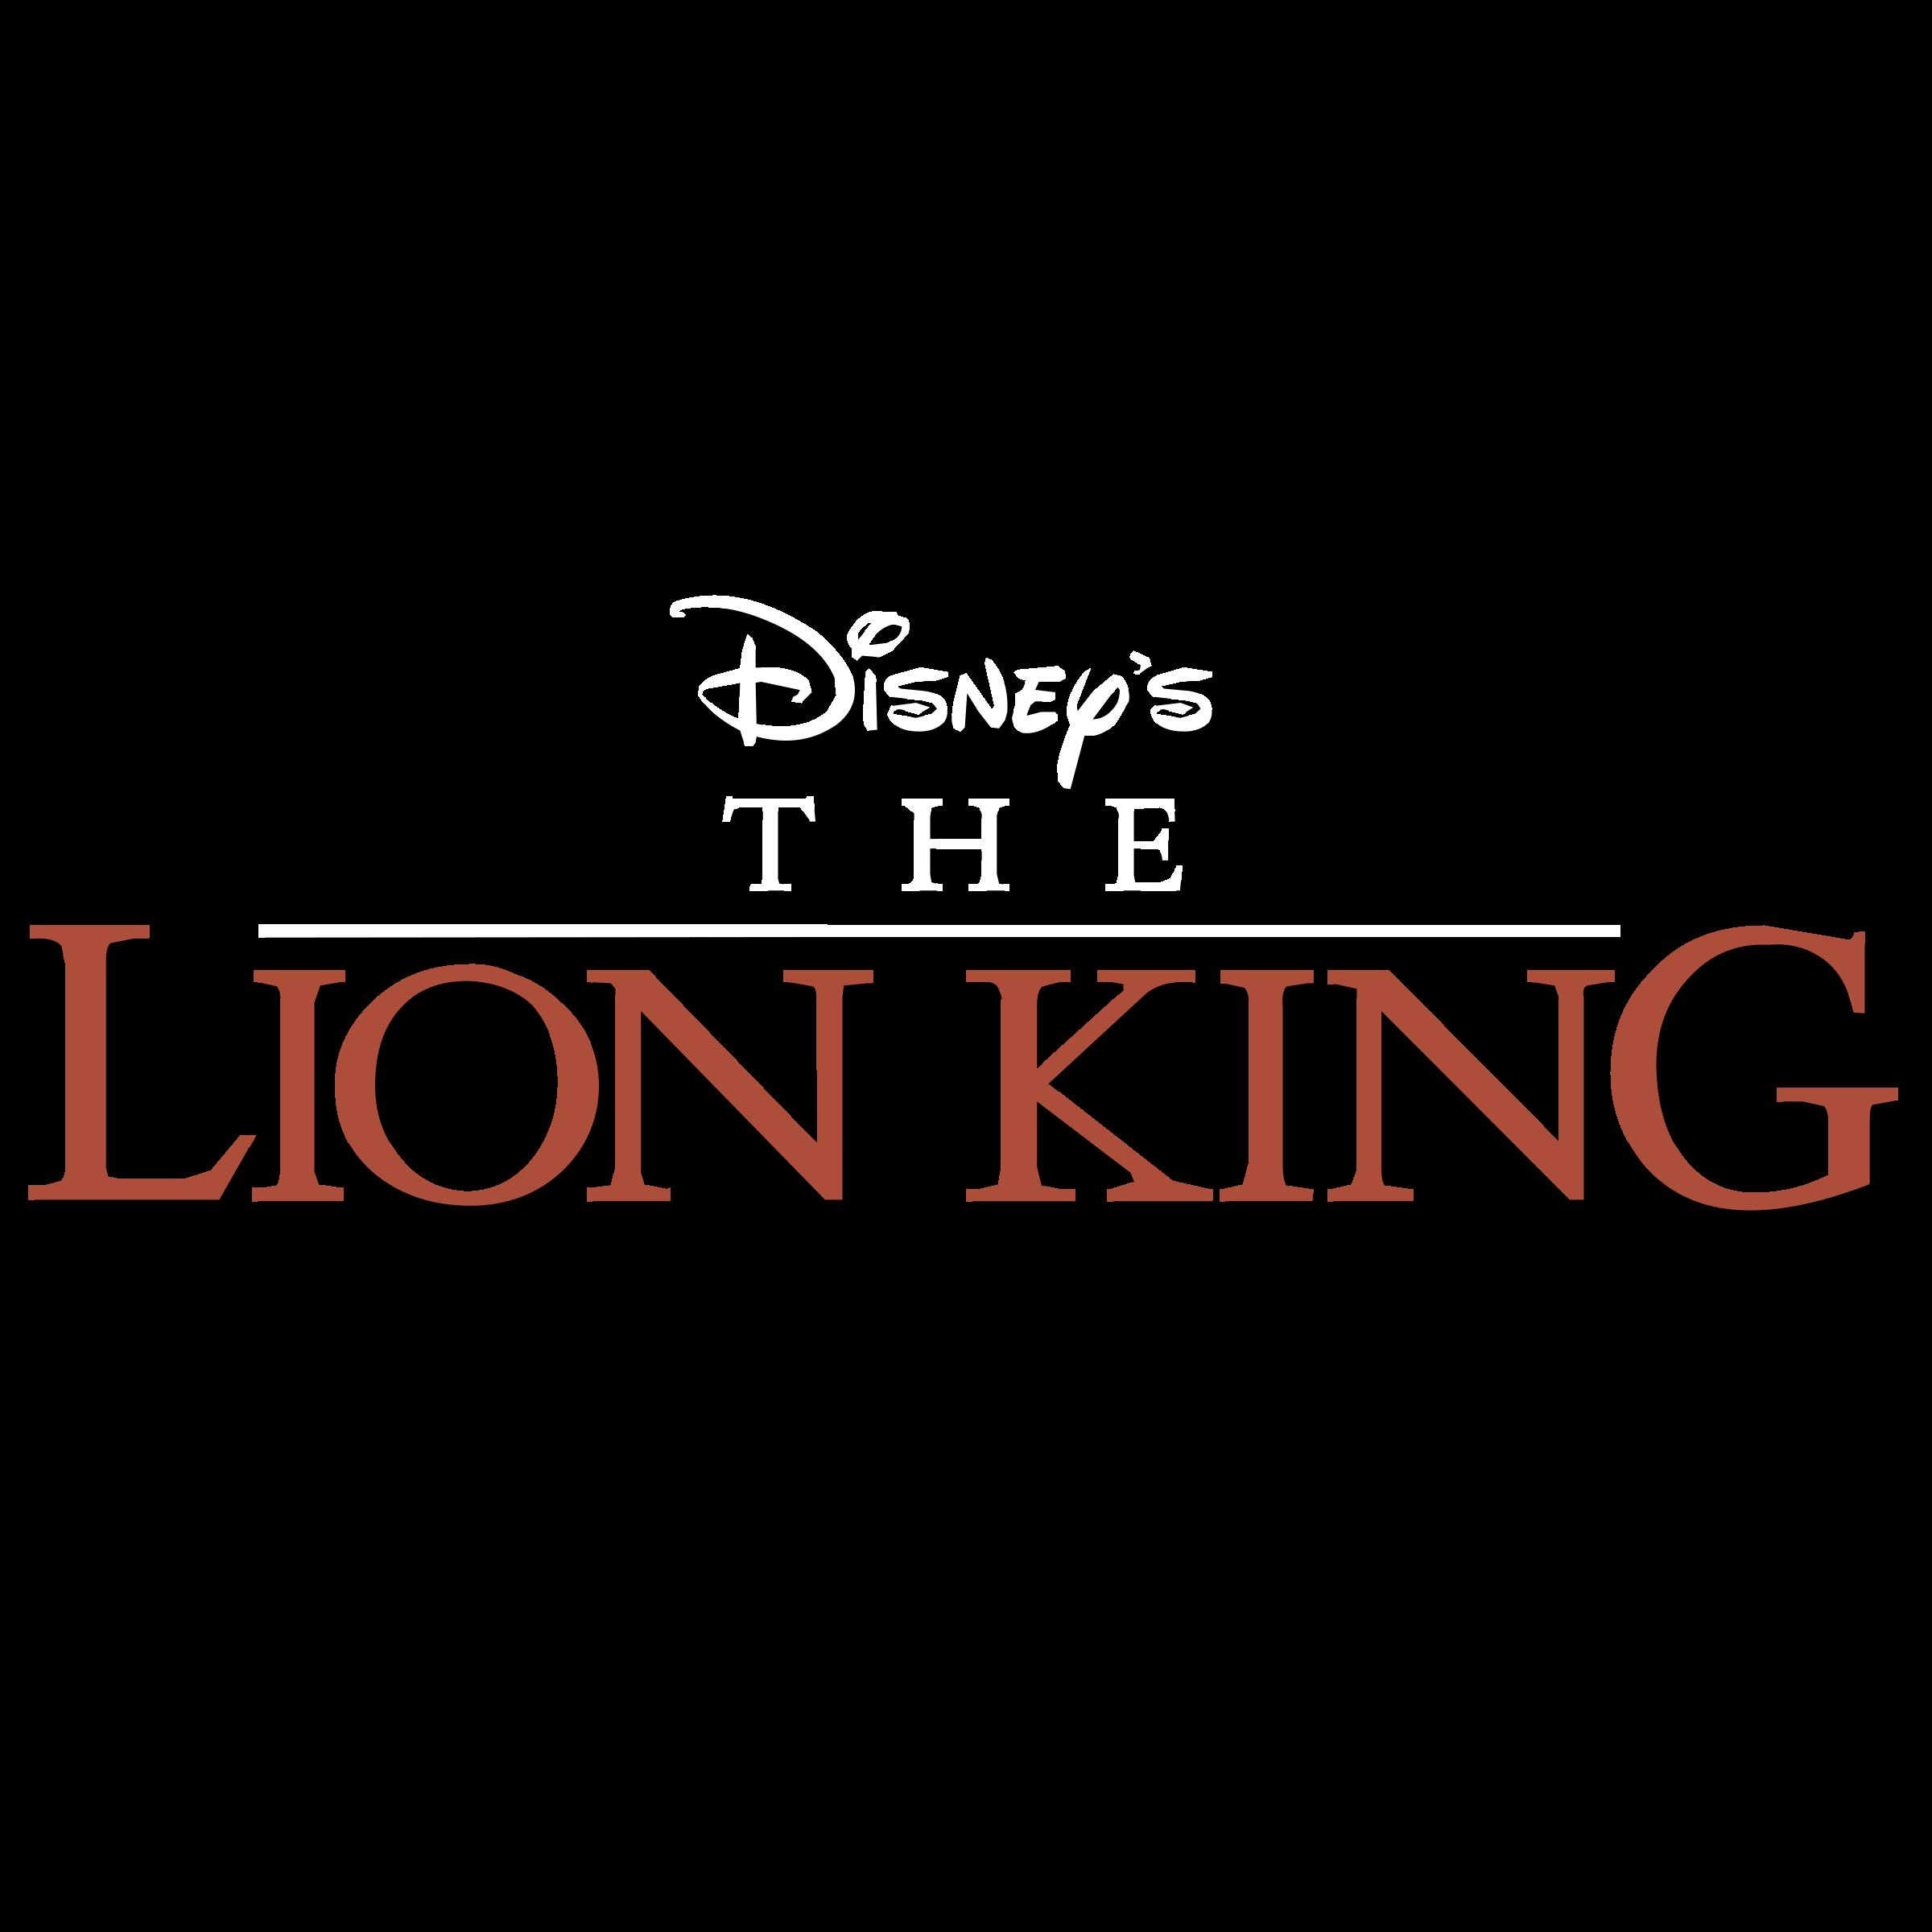 Disney's The Lion King Logo PNG Transparent & SVG Vector - Freebie